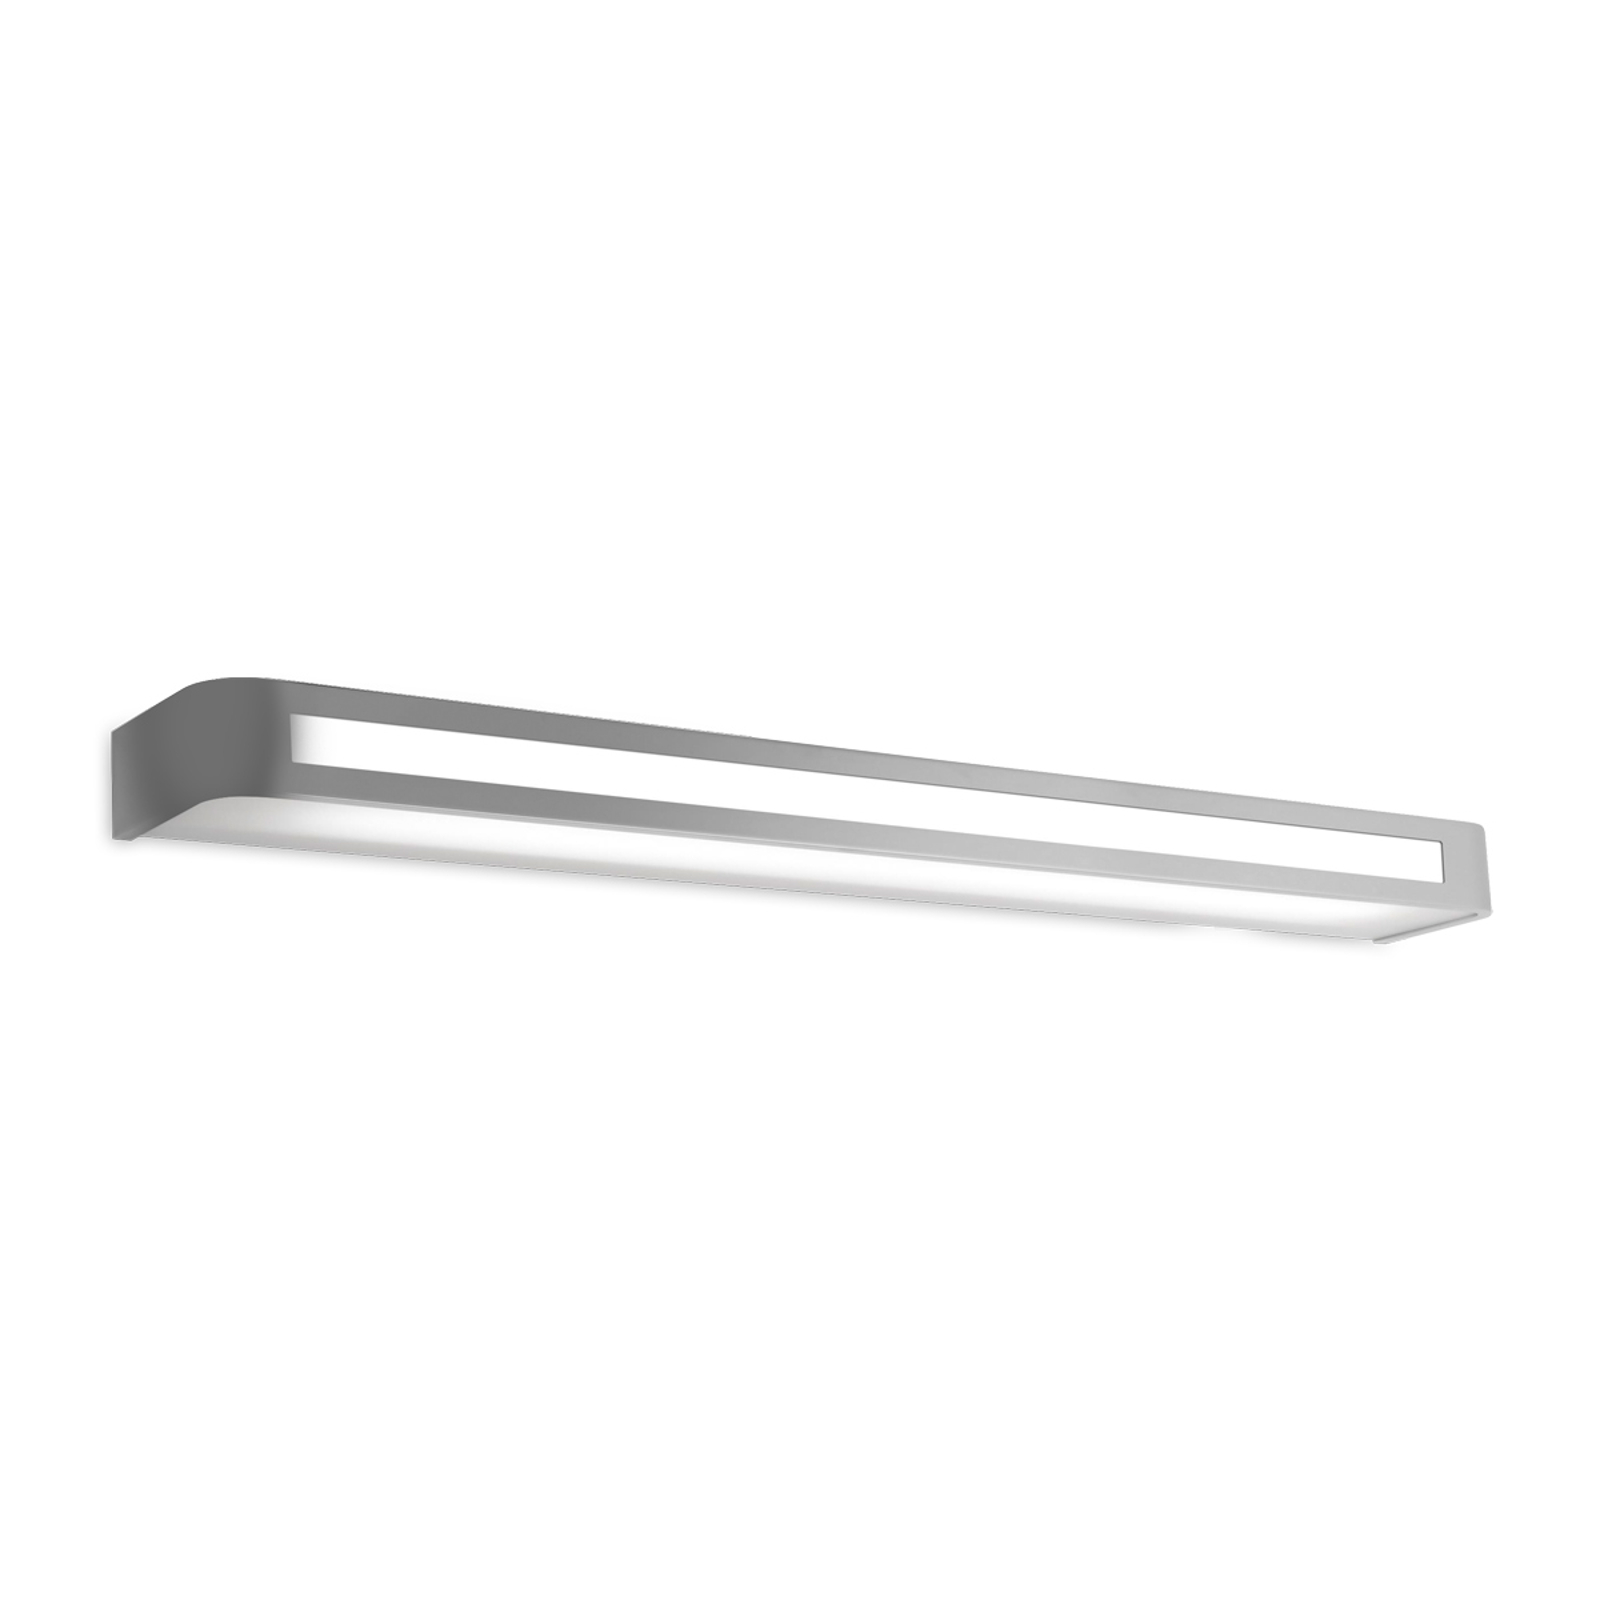 Zeitlose LED-Wandleuchte Arcos, IP20 90 cm, chrom